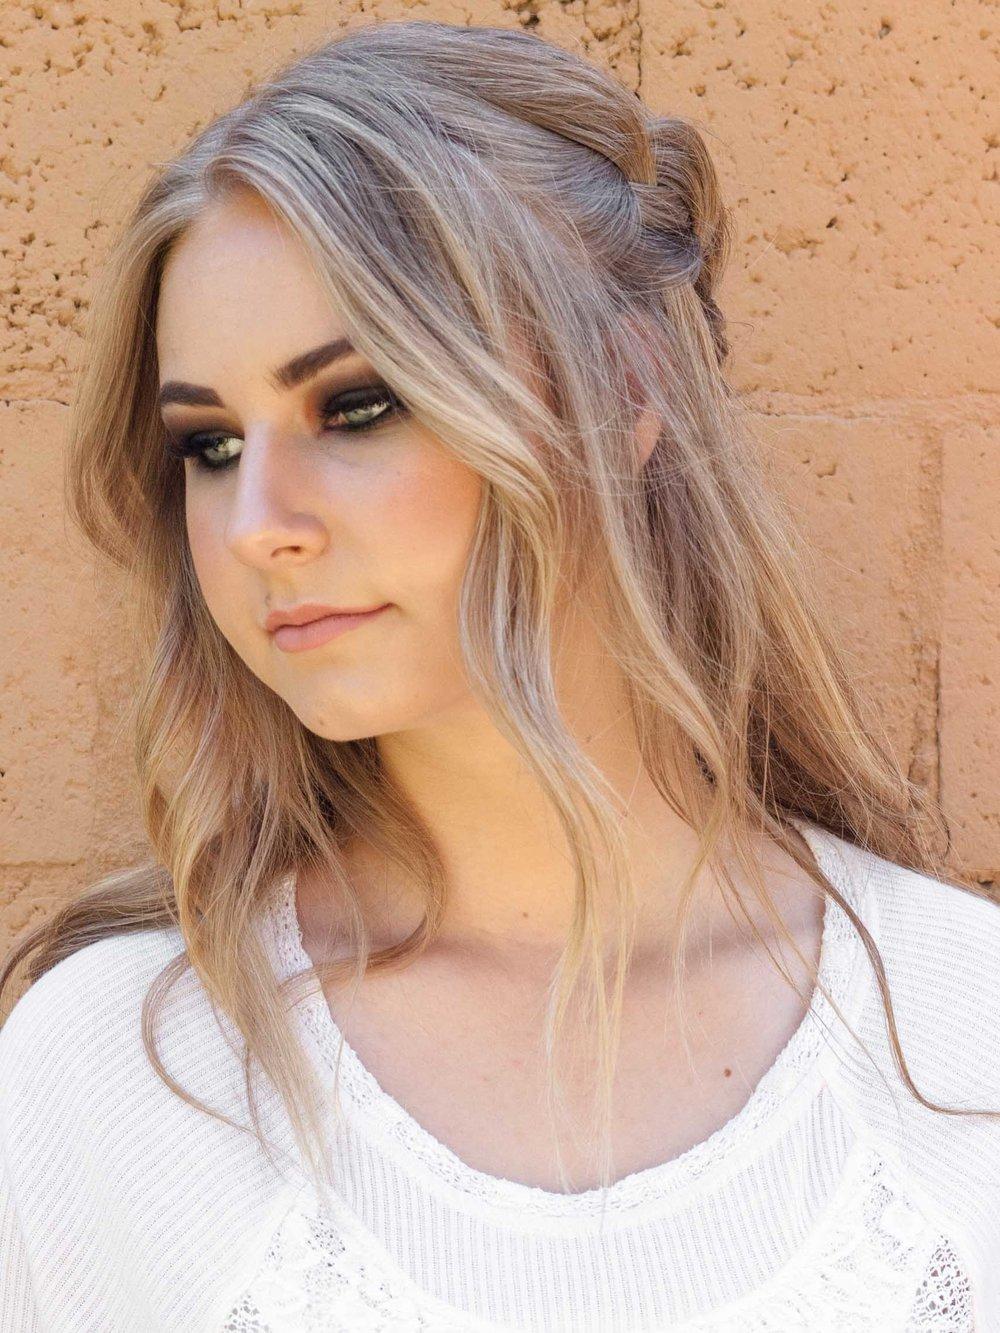 talia-whatcott-makeup-artist-portfolio-blog-hair-waterfall-braid-smoky-eye-matte-lip-bridal-wedding-tousled-curls-1-10.jpg